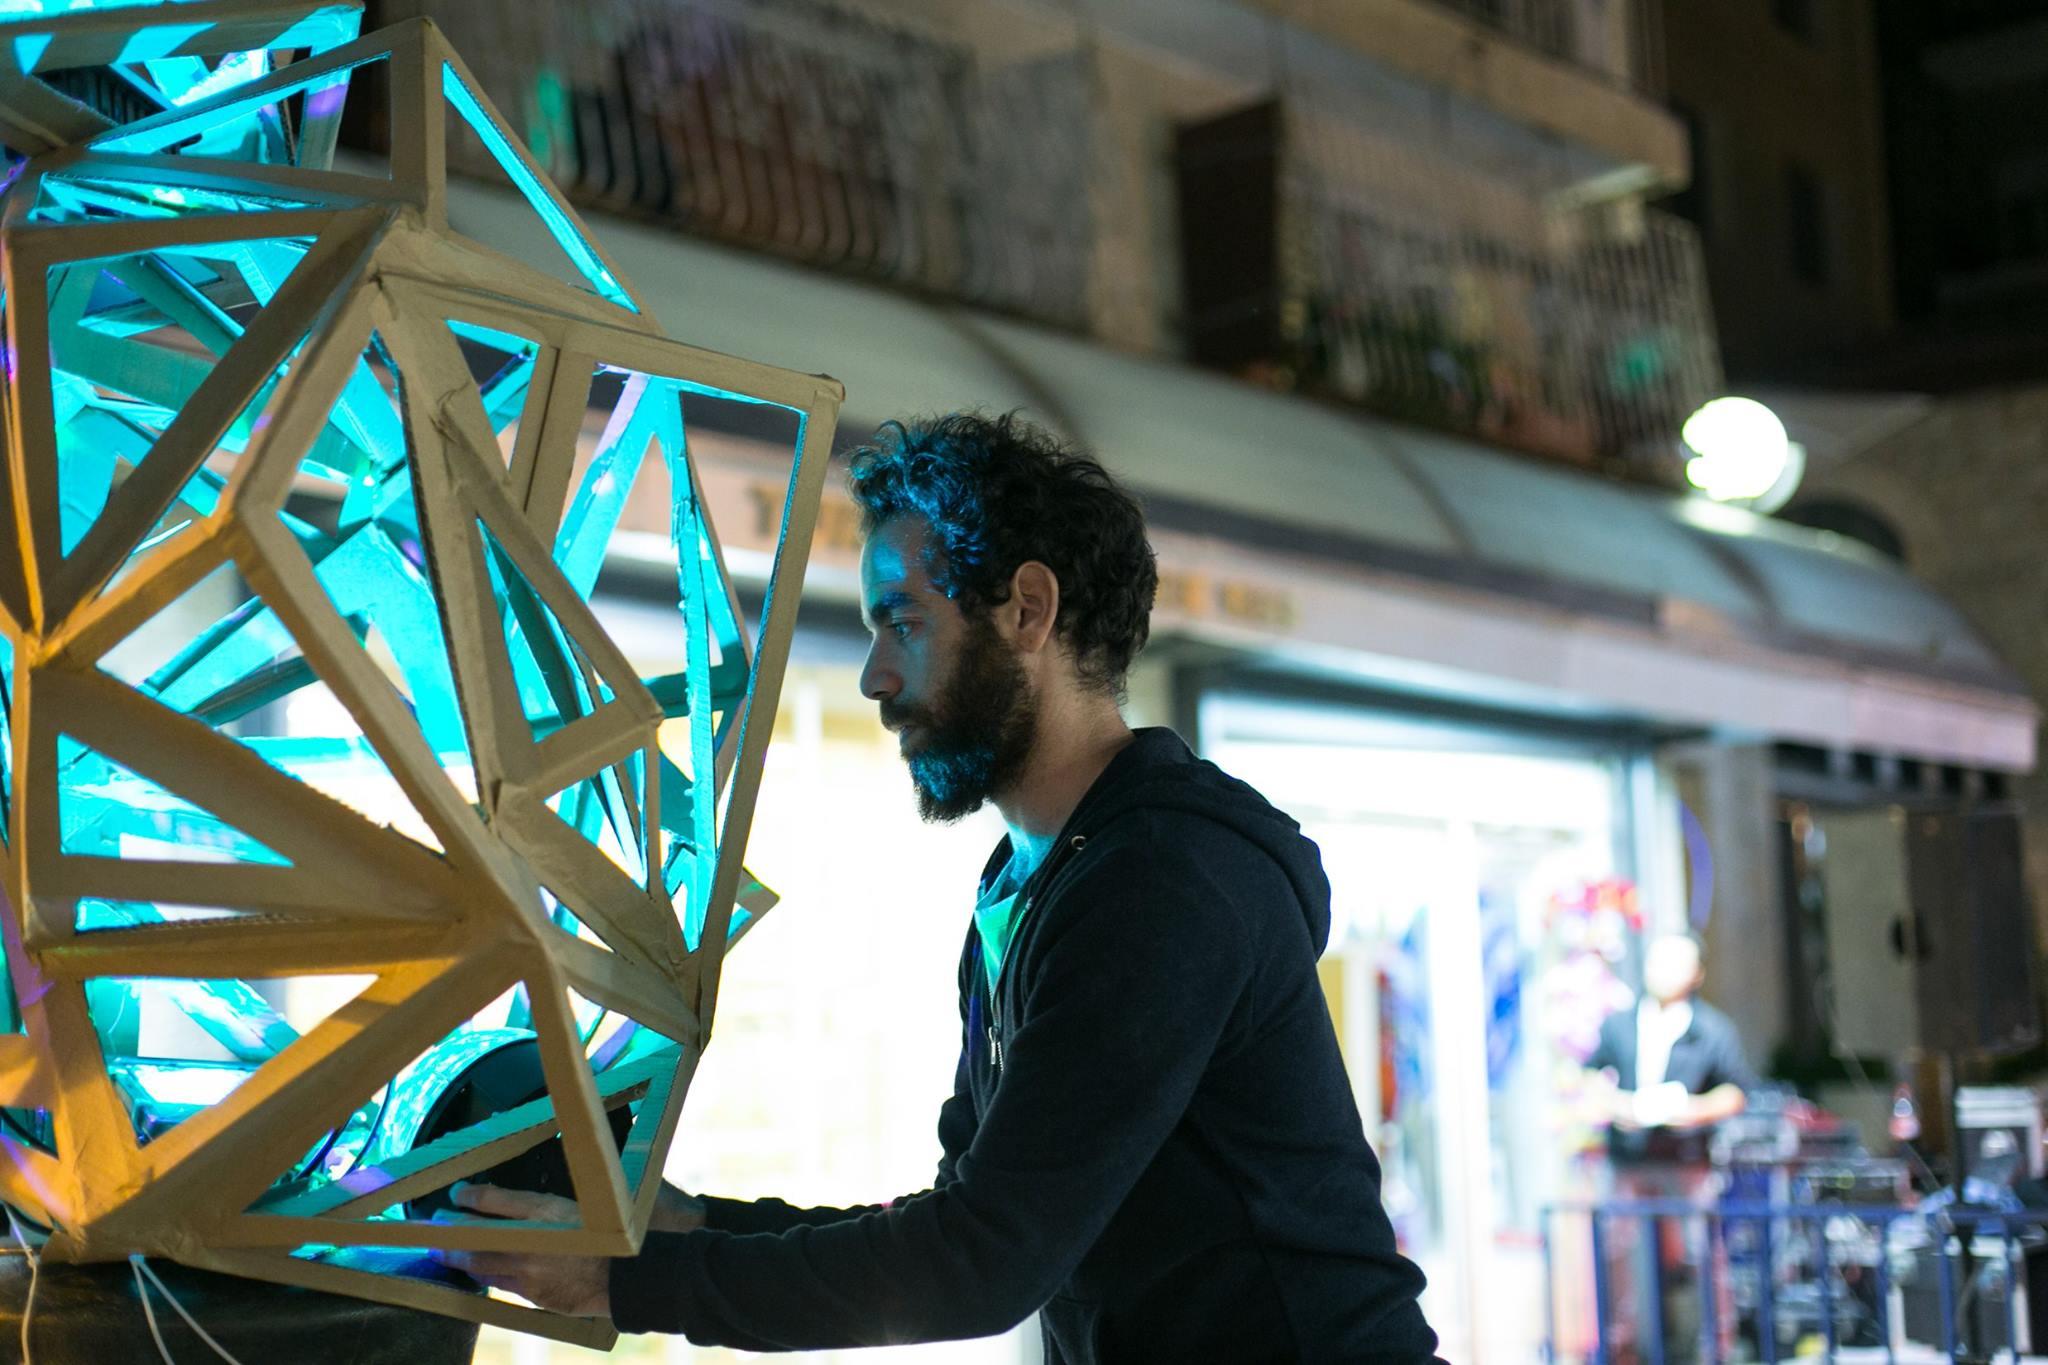 sculptor displays art piece in the street during Shaon Horef Jerusalem winter festival